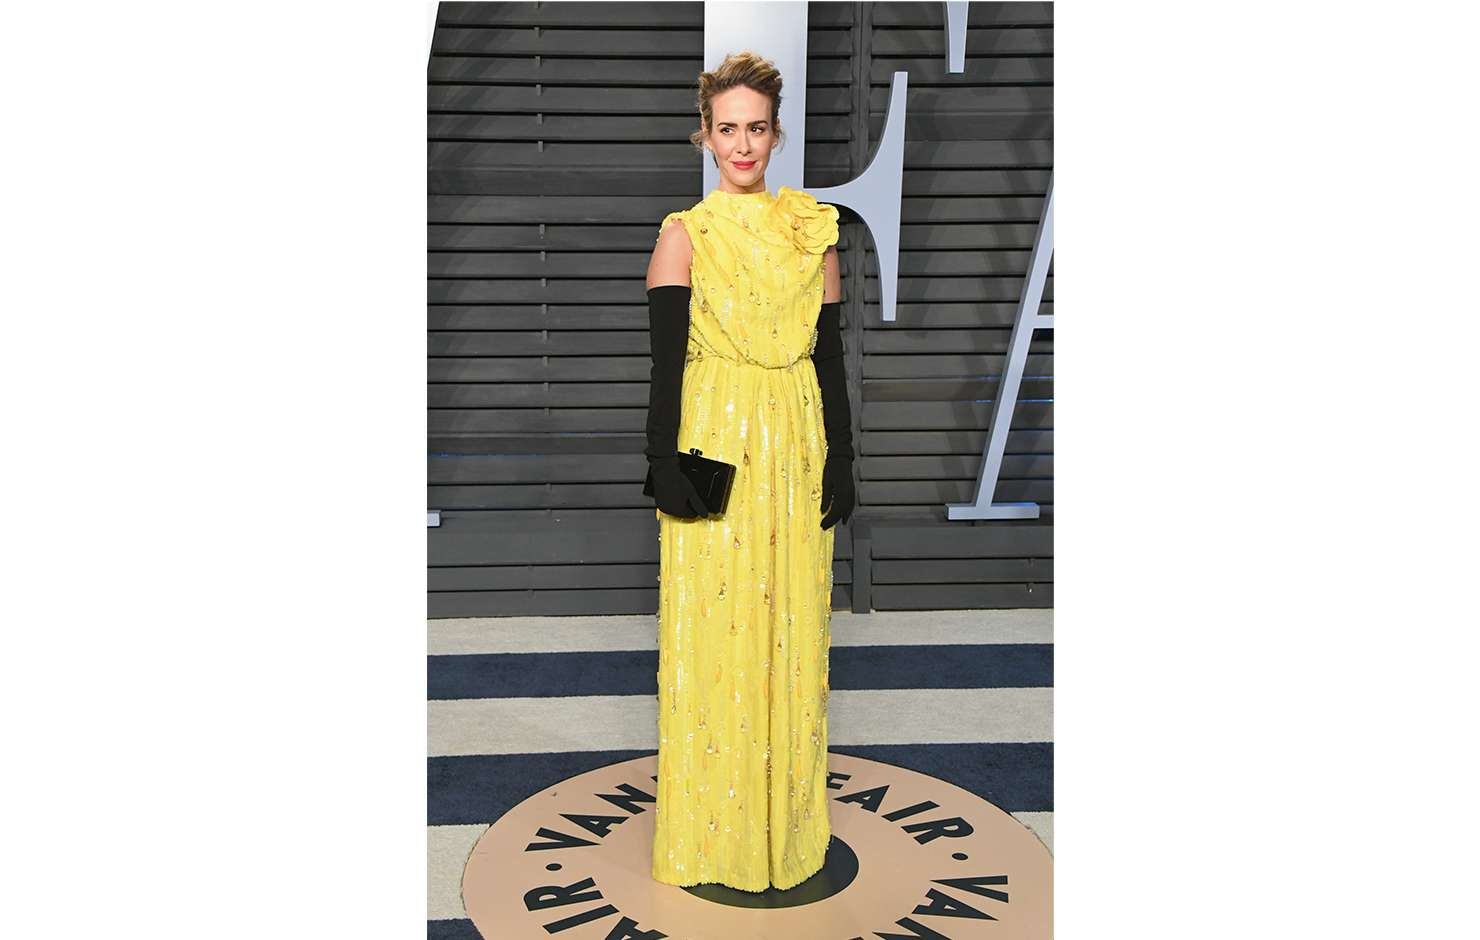 Sarah Paulson wearing Marc Jacobs Spring 2018 at the Vanity Fair Oscar Party